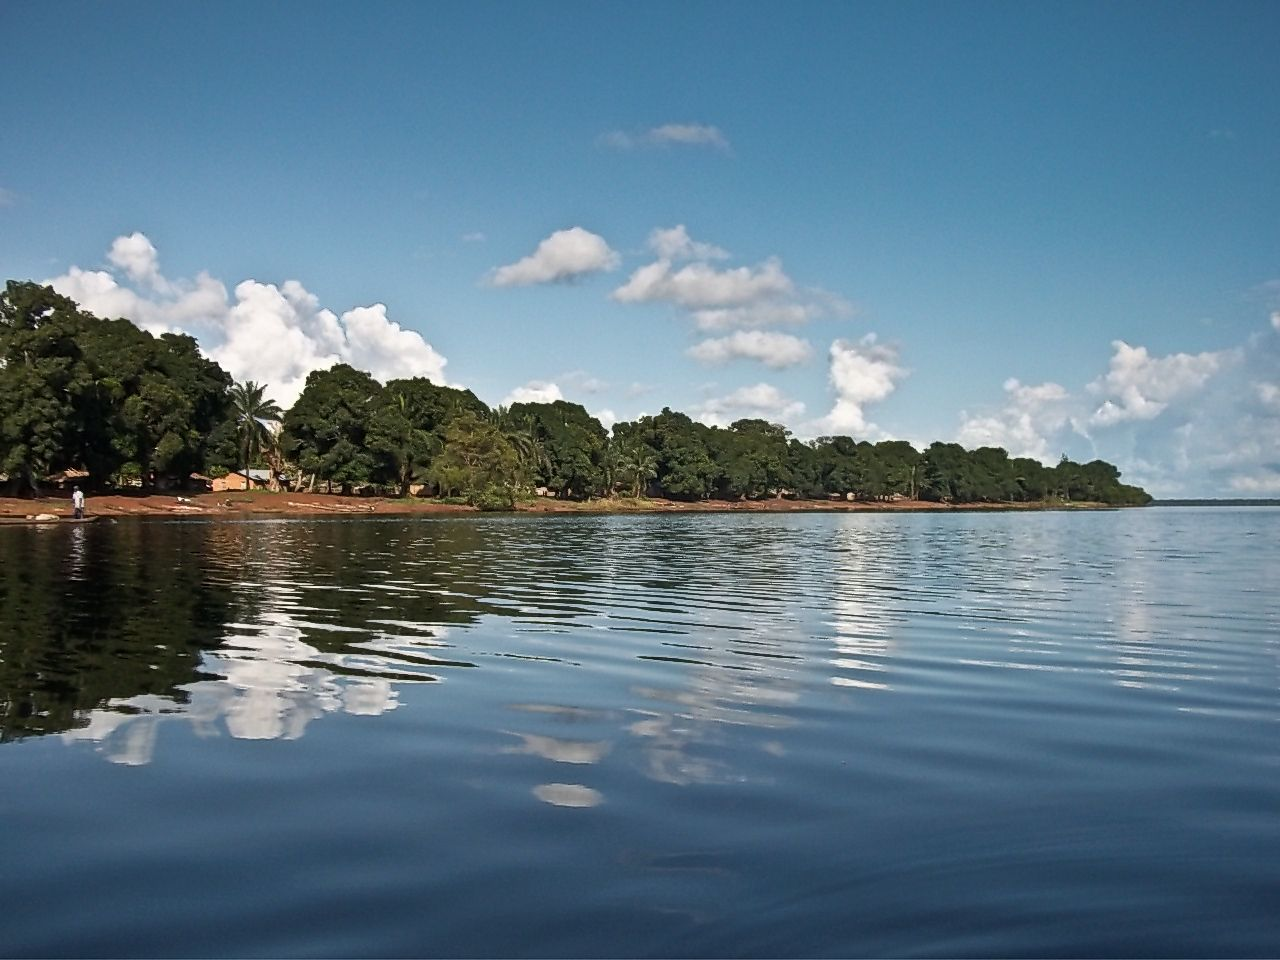 Riviere Et Lac Patrick Willocq 6 Jpg Crop Display Jpg 1280 960 Waterscape Outdoor Congo